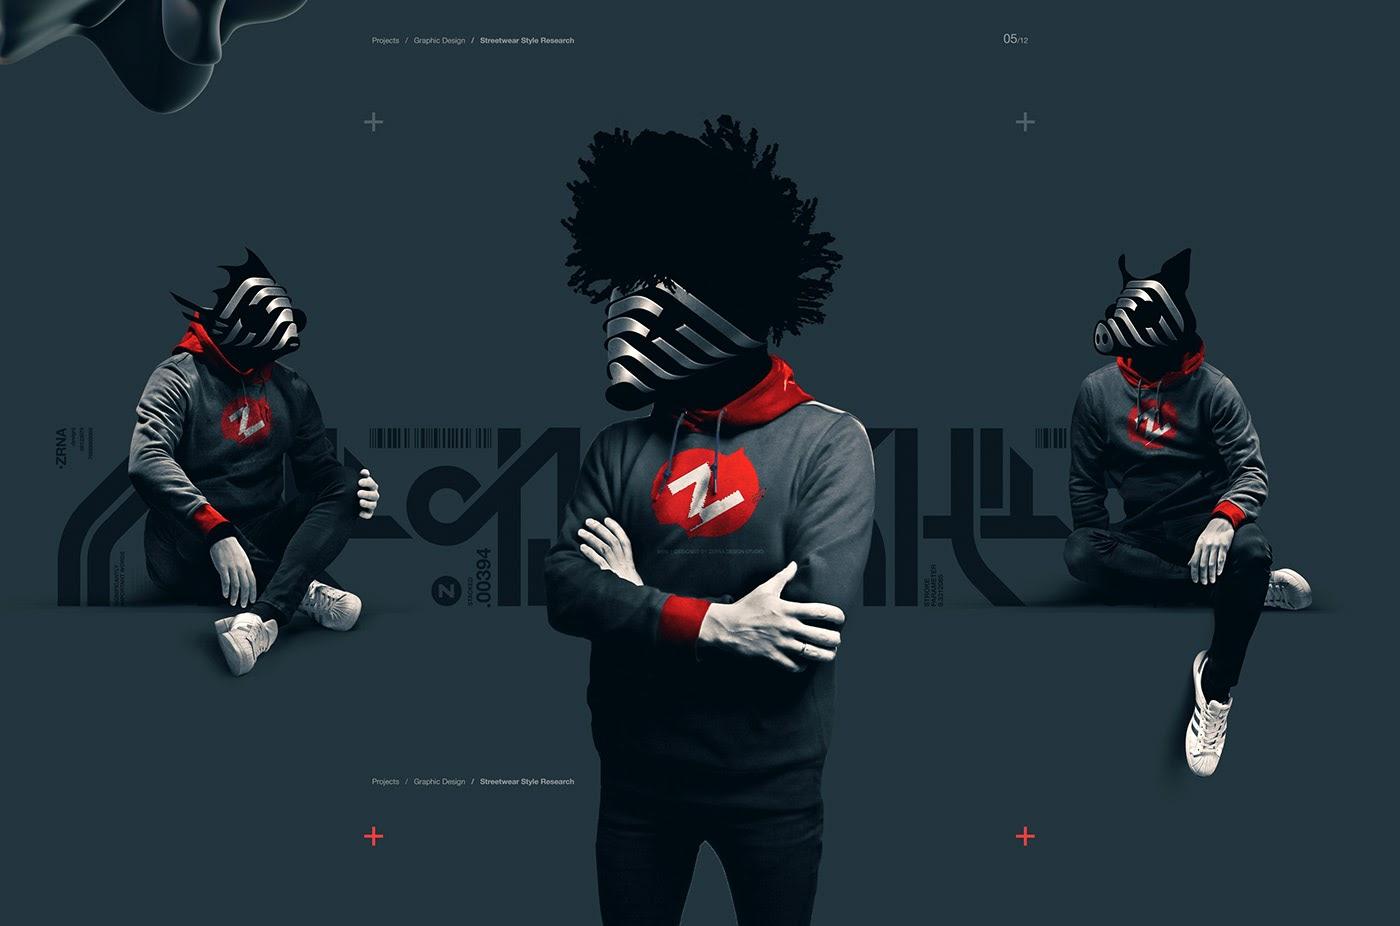 Pavel Zertsikel精美的数字艺术和3D字体设计